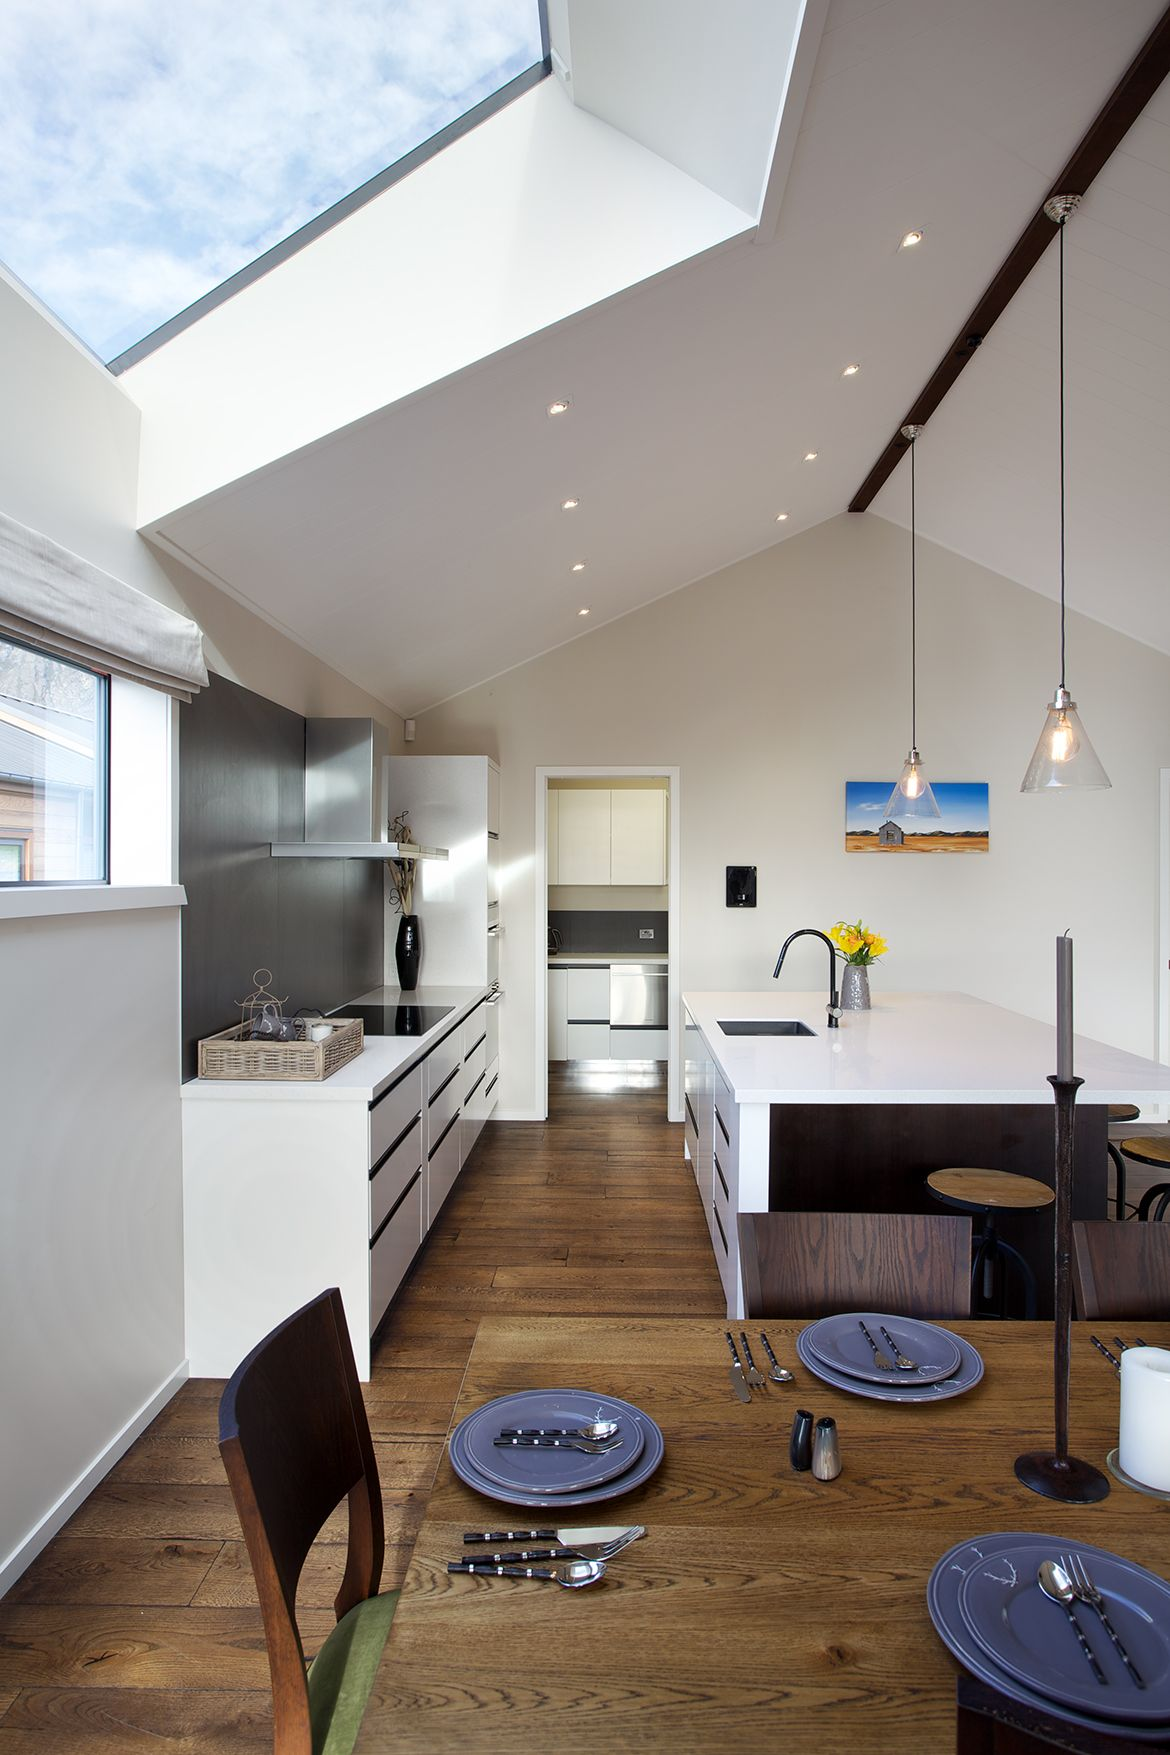 Kitchen with Skylight - Kitchen Design Ideas   My dream house ...